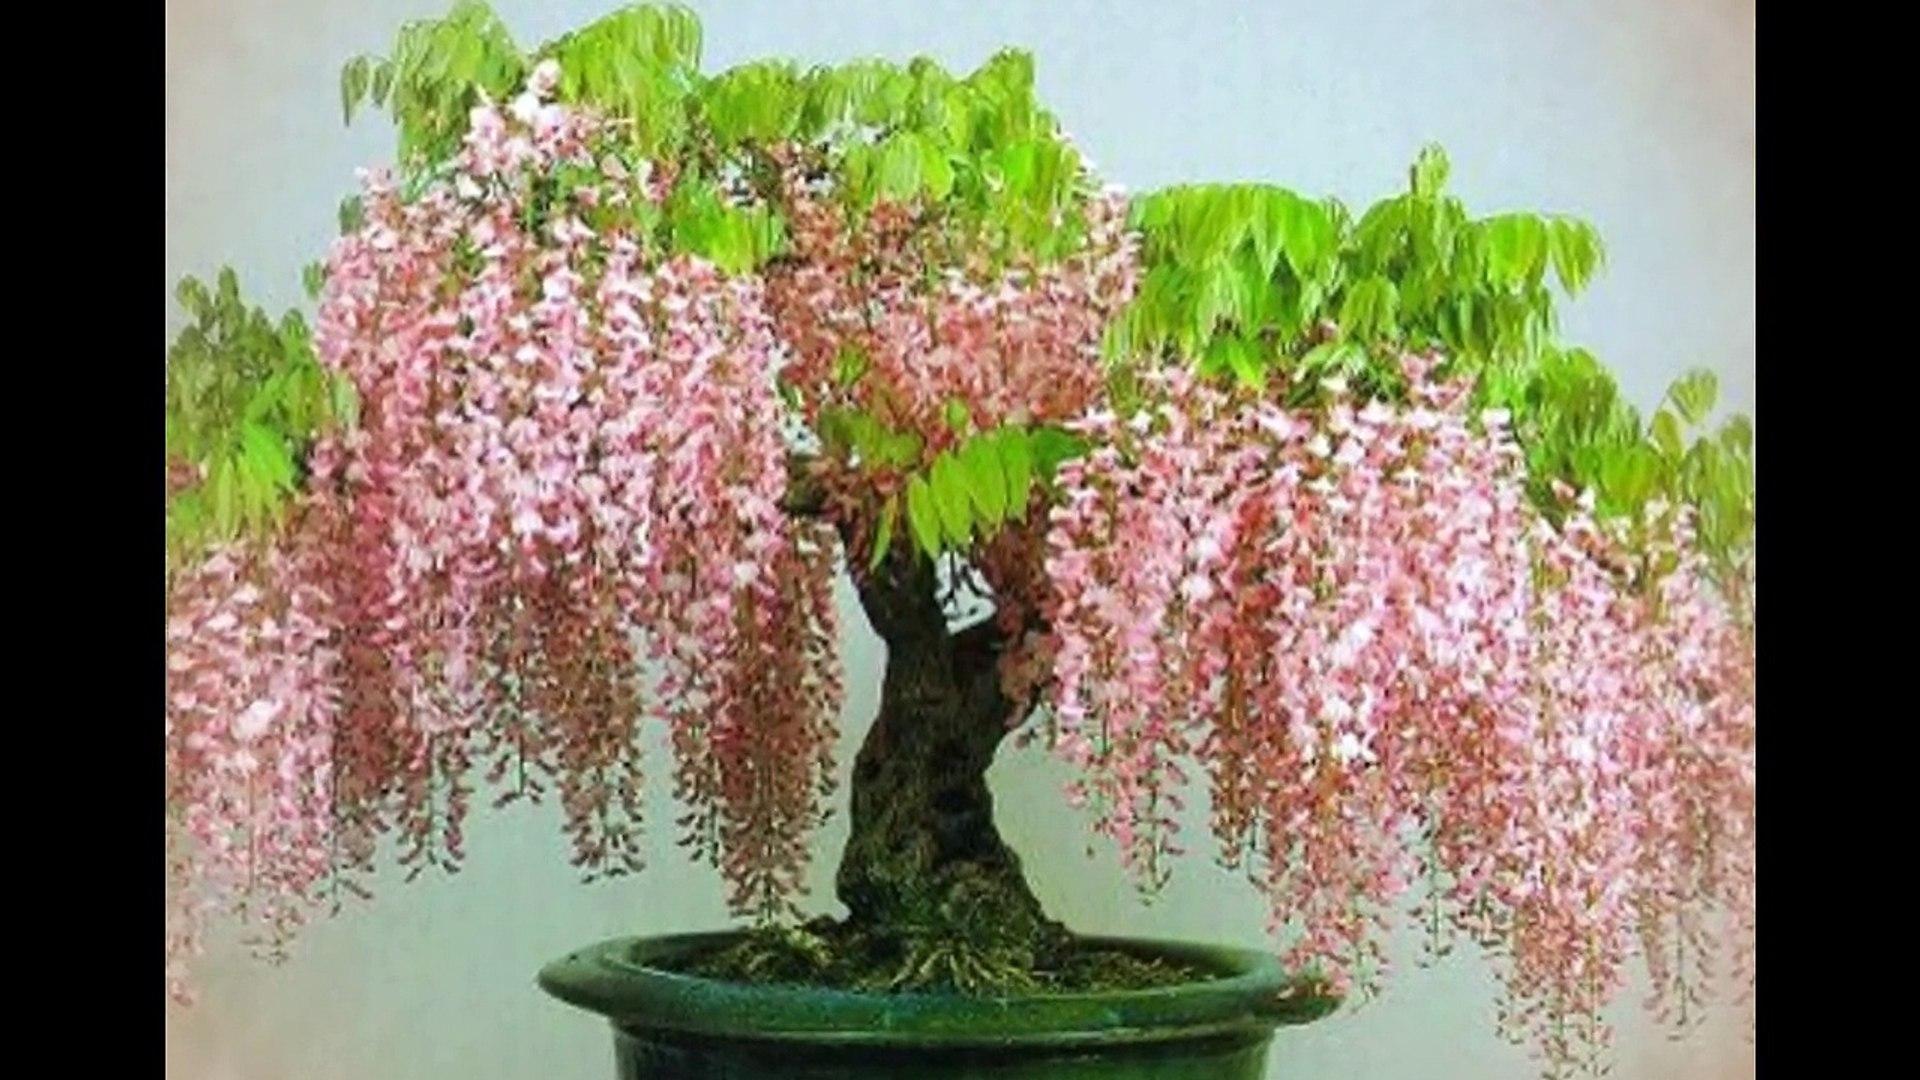 Blue Jacaranda Jacaranda Mimosifolia Or Wisteria Bonsai Tree Video Dailymotion